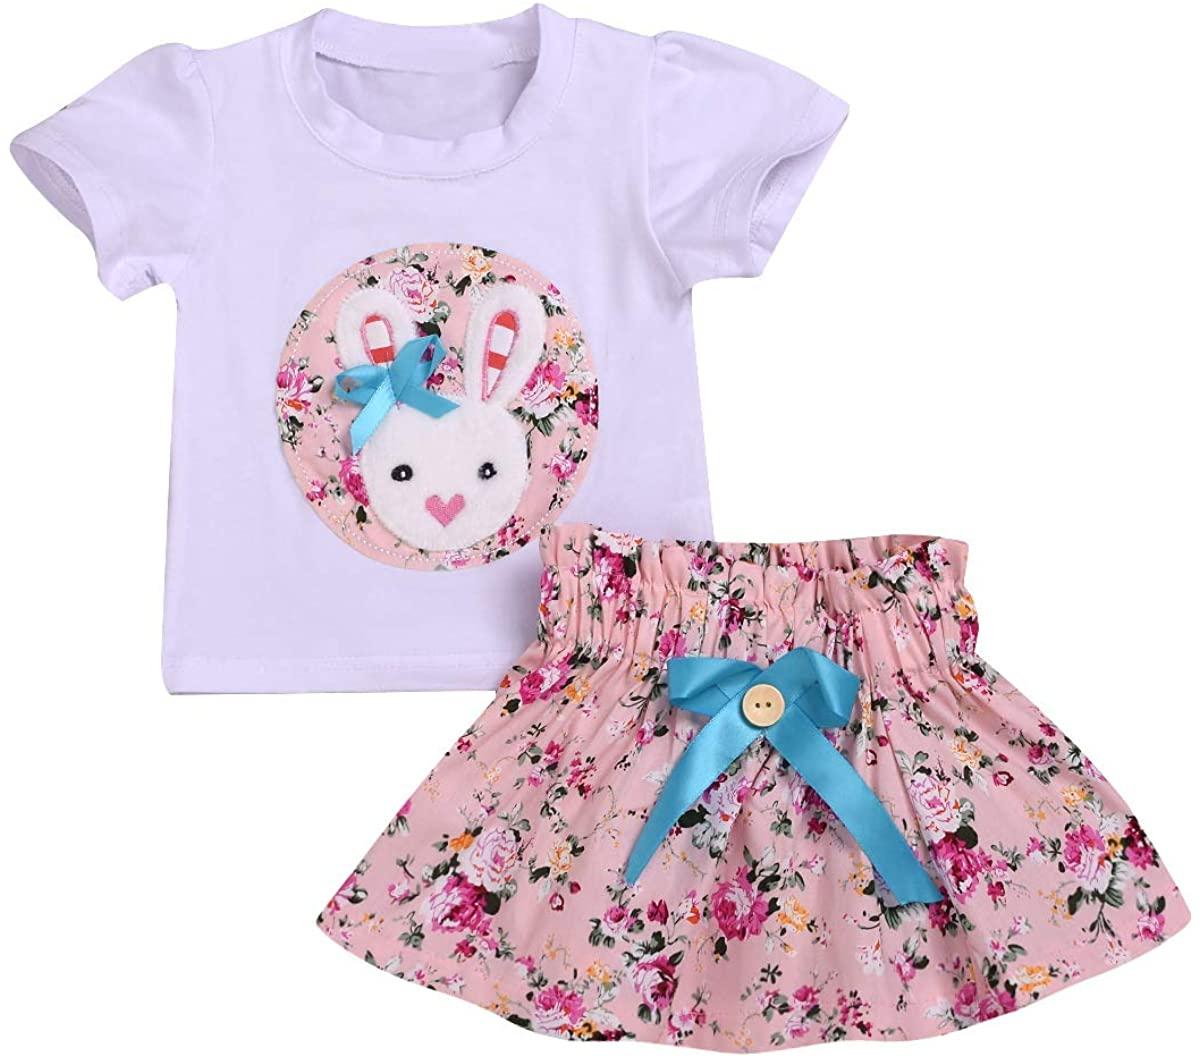 Toddler Kids Baby Girl Easter Skirt Outfit Bunny Rabbit Short Sleeve T-Shirt Top + Floral Tutu Skirt Clothing Set